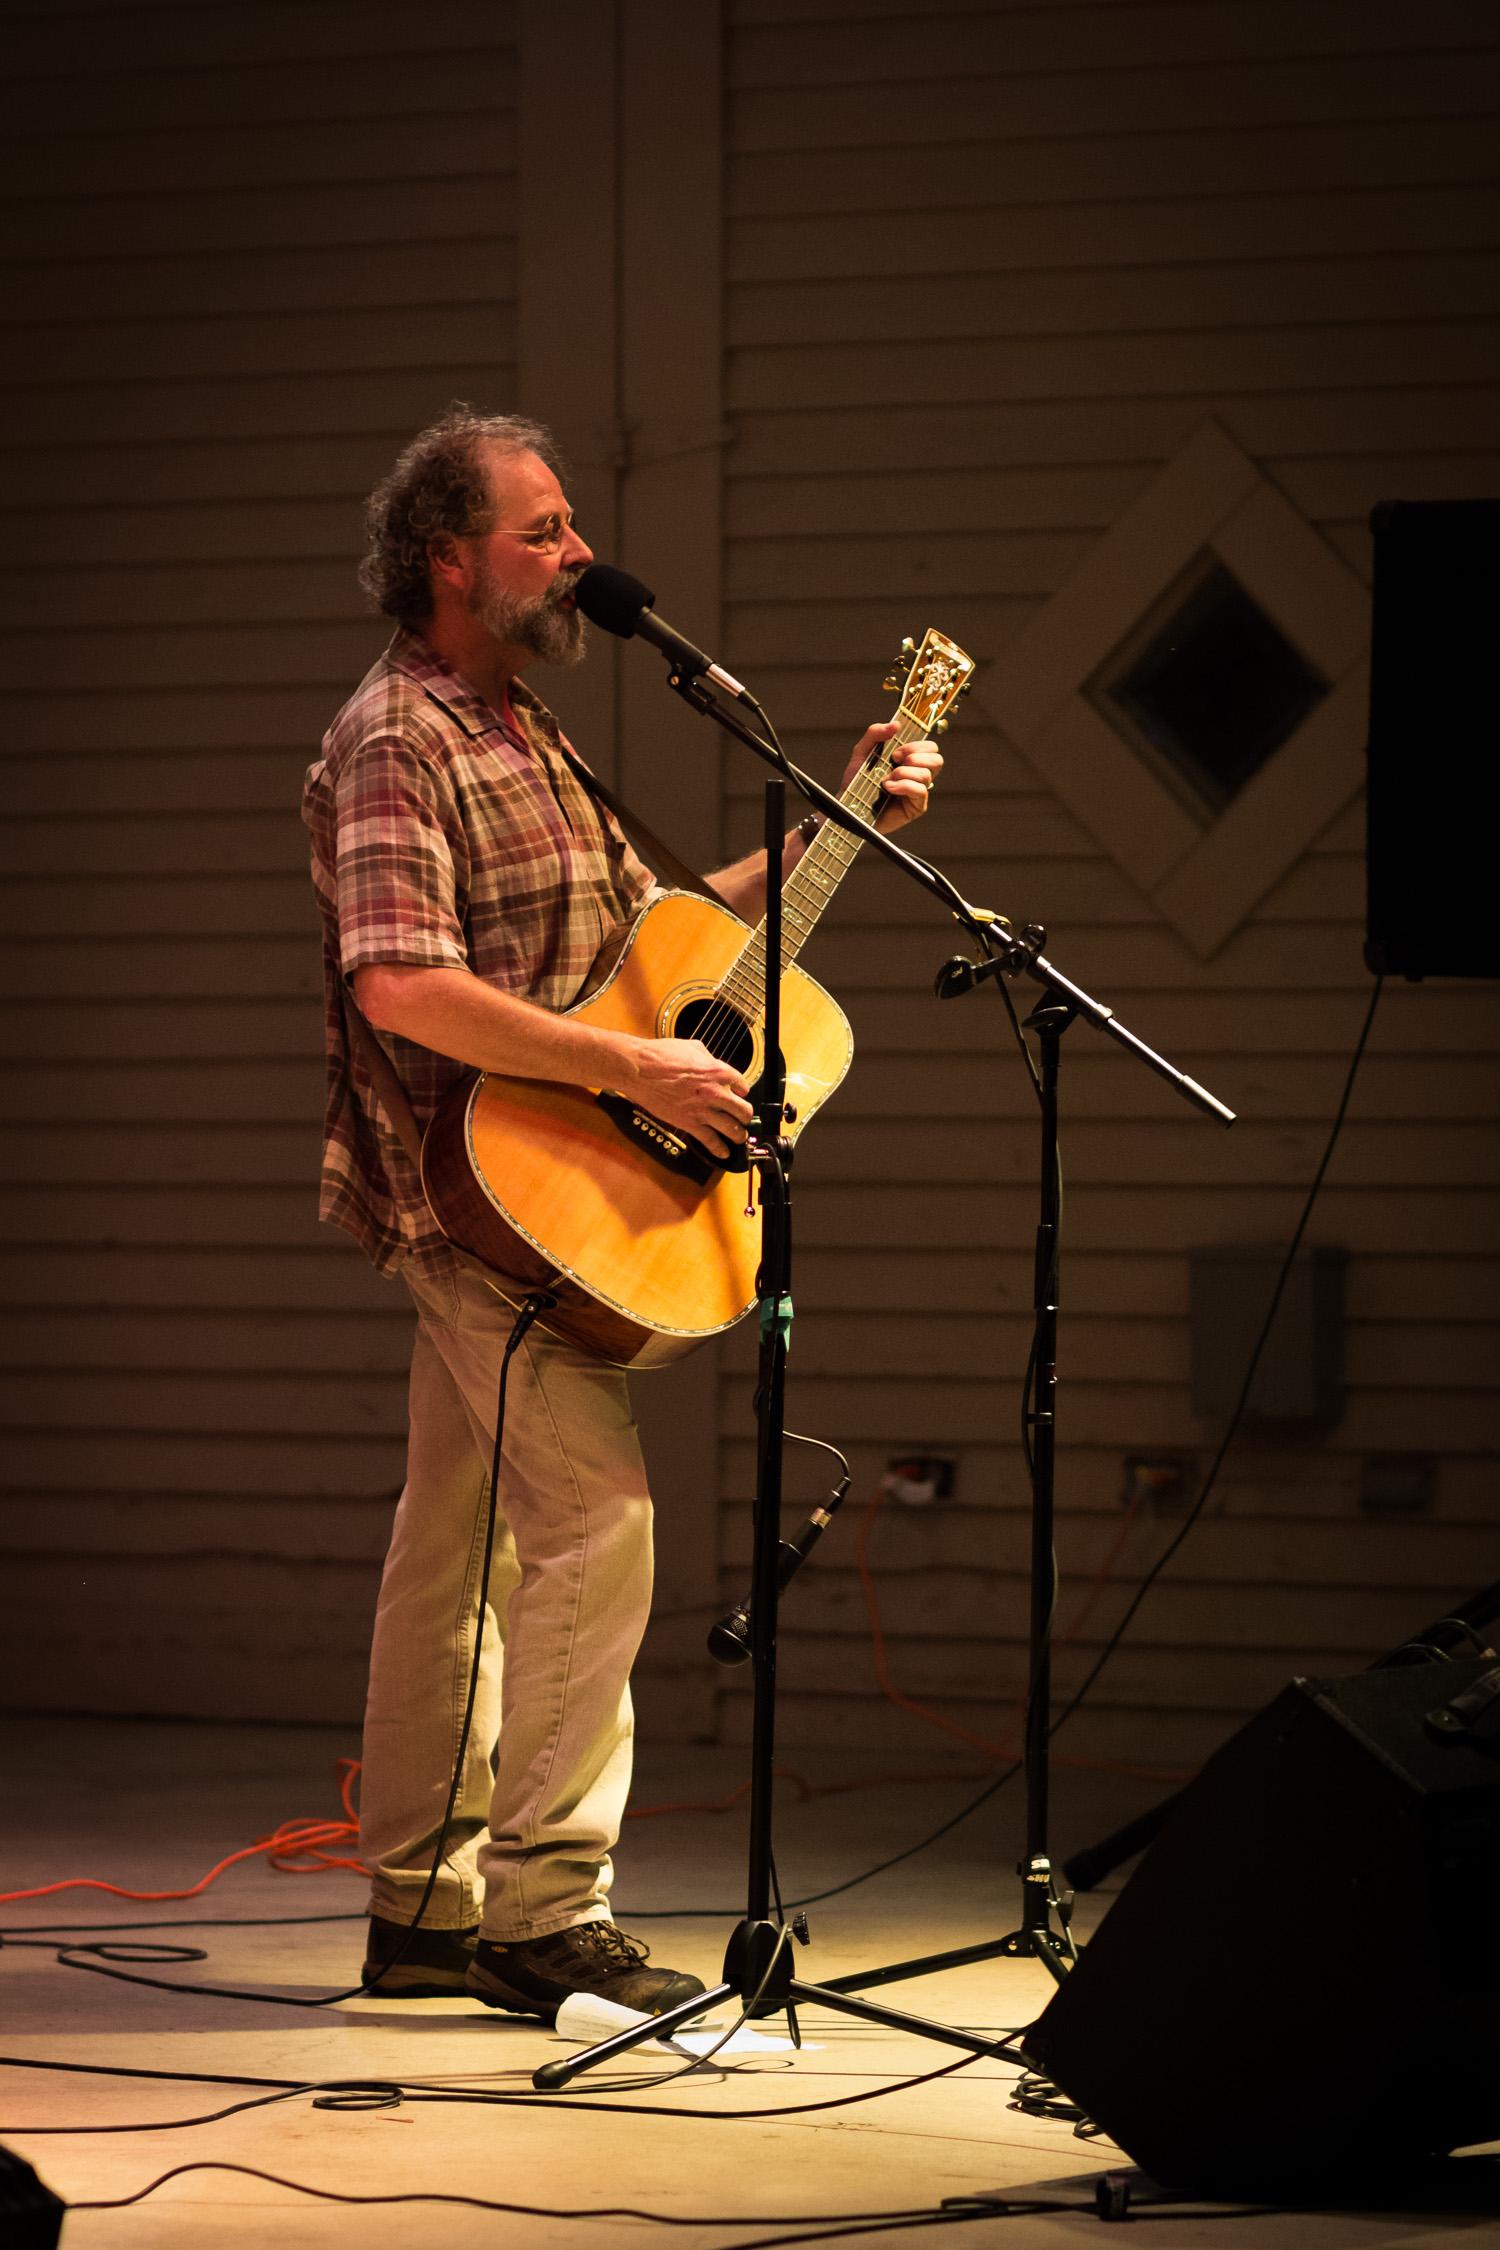 George VanDusen -Guitar, Vocals